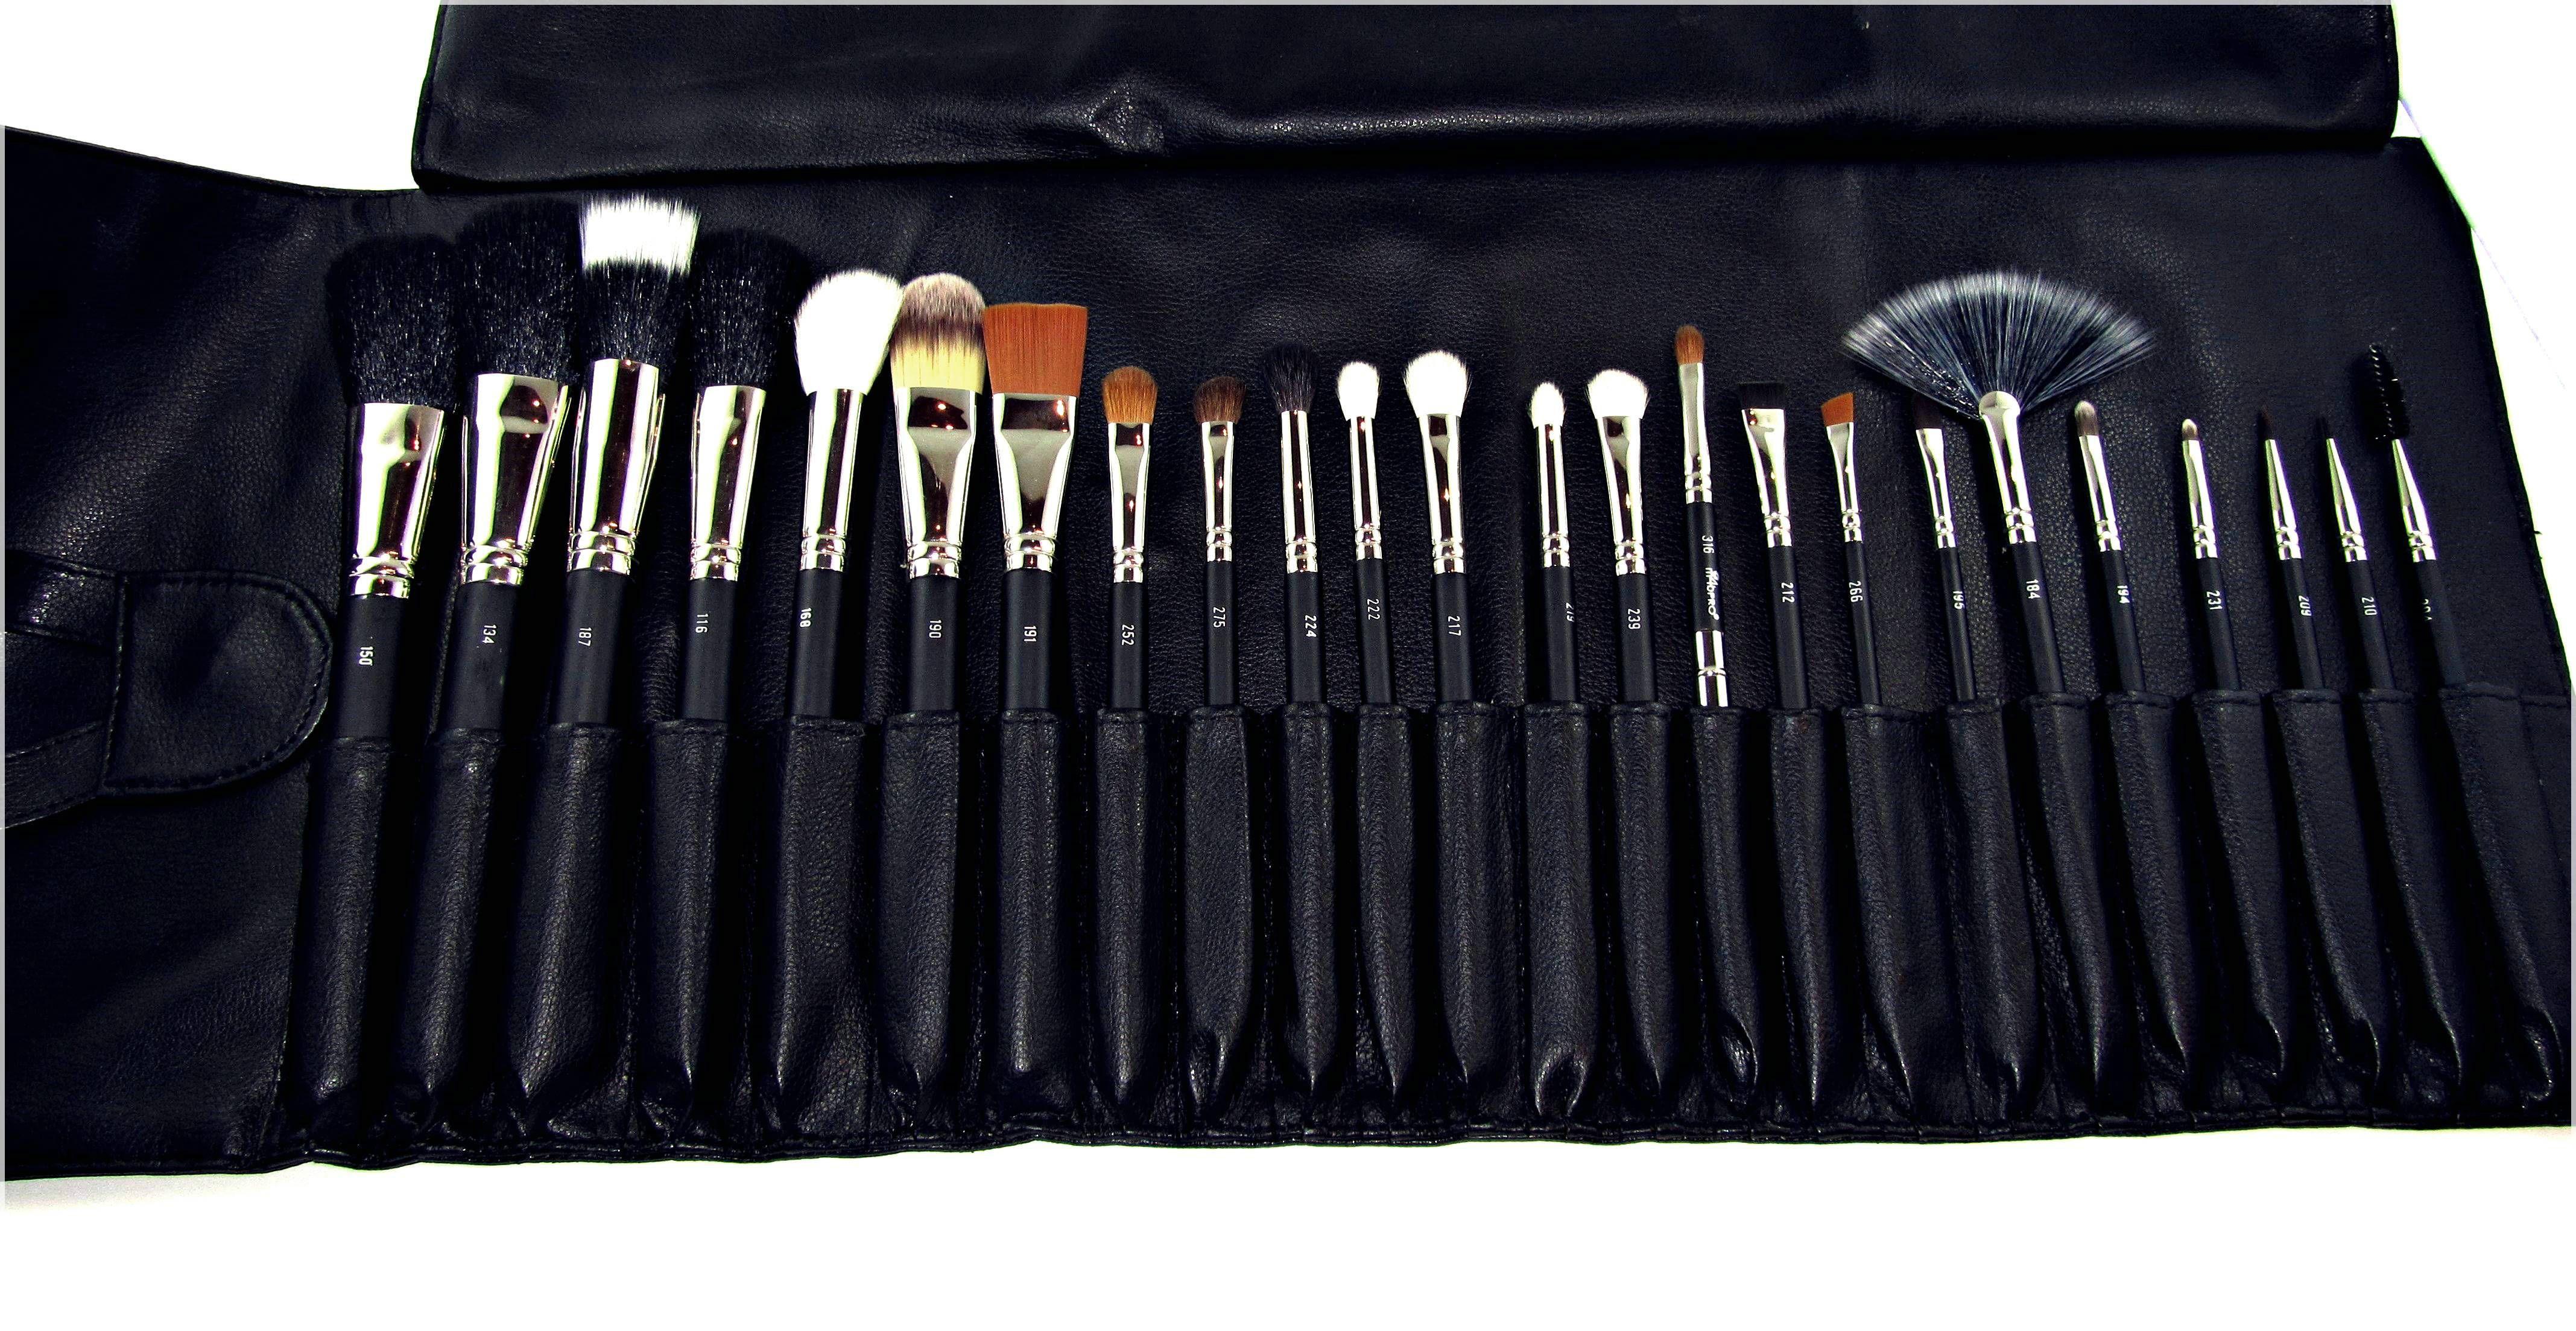 www.machut.us on Mac makeup brushes set, Mac makeup